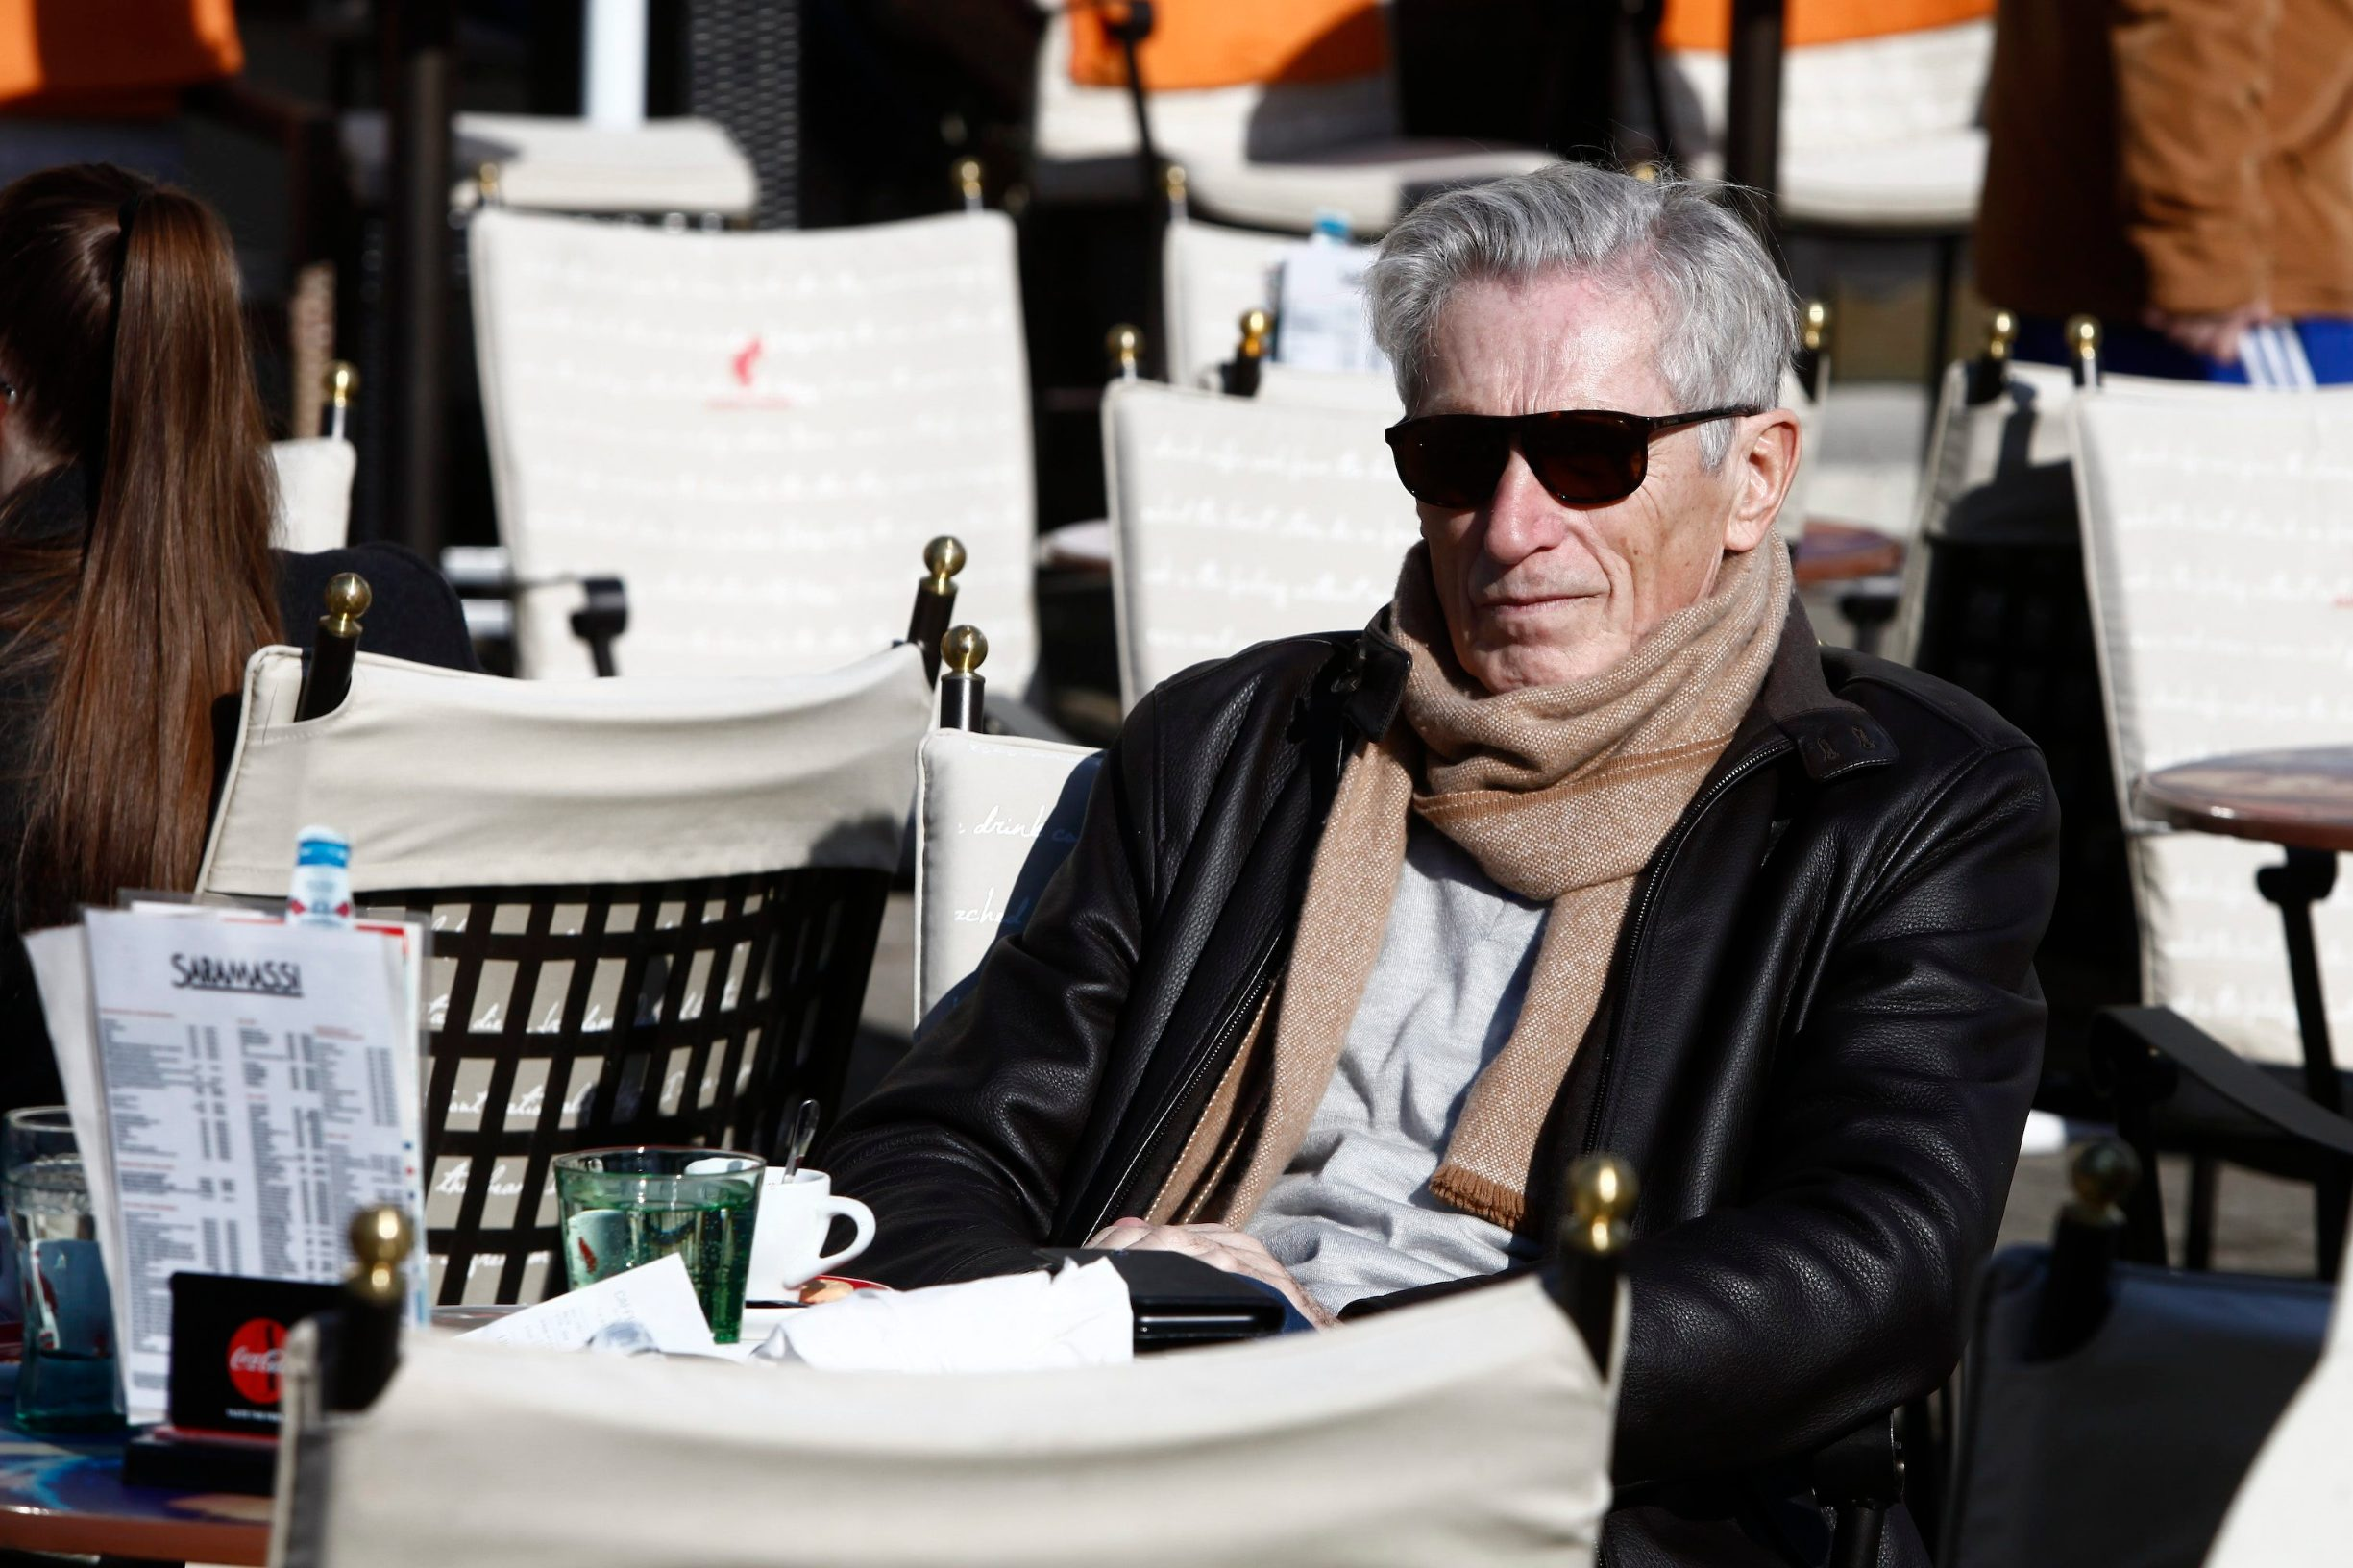 Samobor, 130220. Trg kralja Tomislava. Tomislav Horvatincic pije kavu na samoborskom glavnom trgu u drustvu prijatelja. Na fotografiji: Tomislav Horvatincic. Foto: Zeljko Puhovski / CROPIX